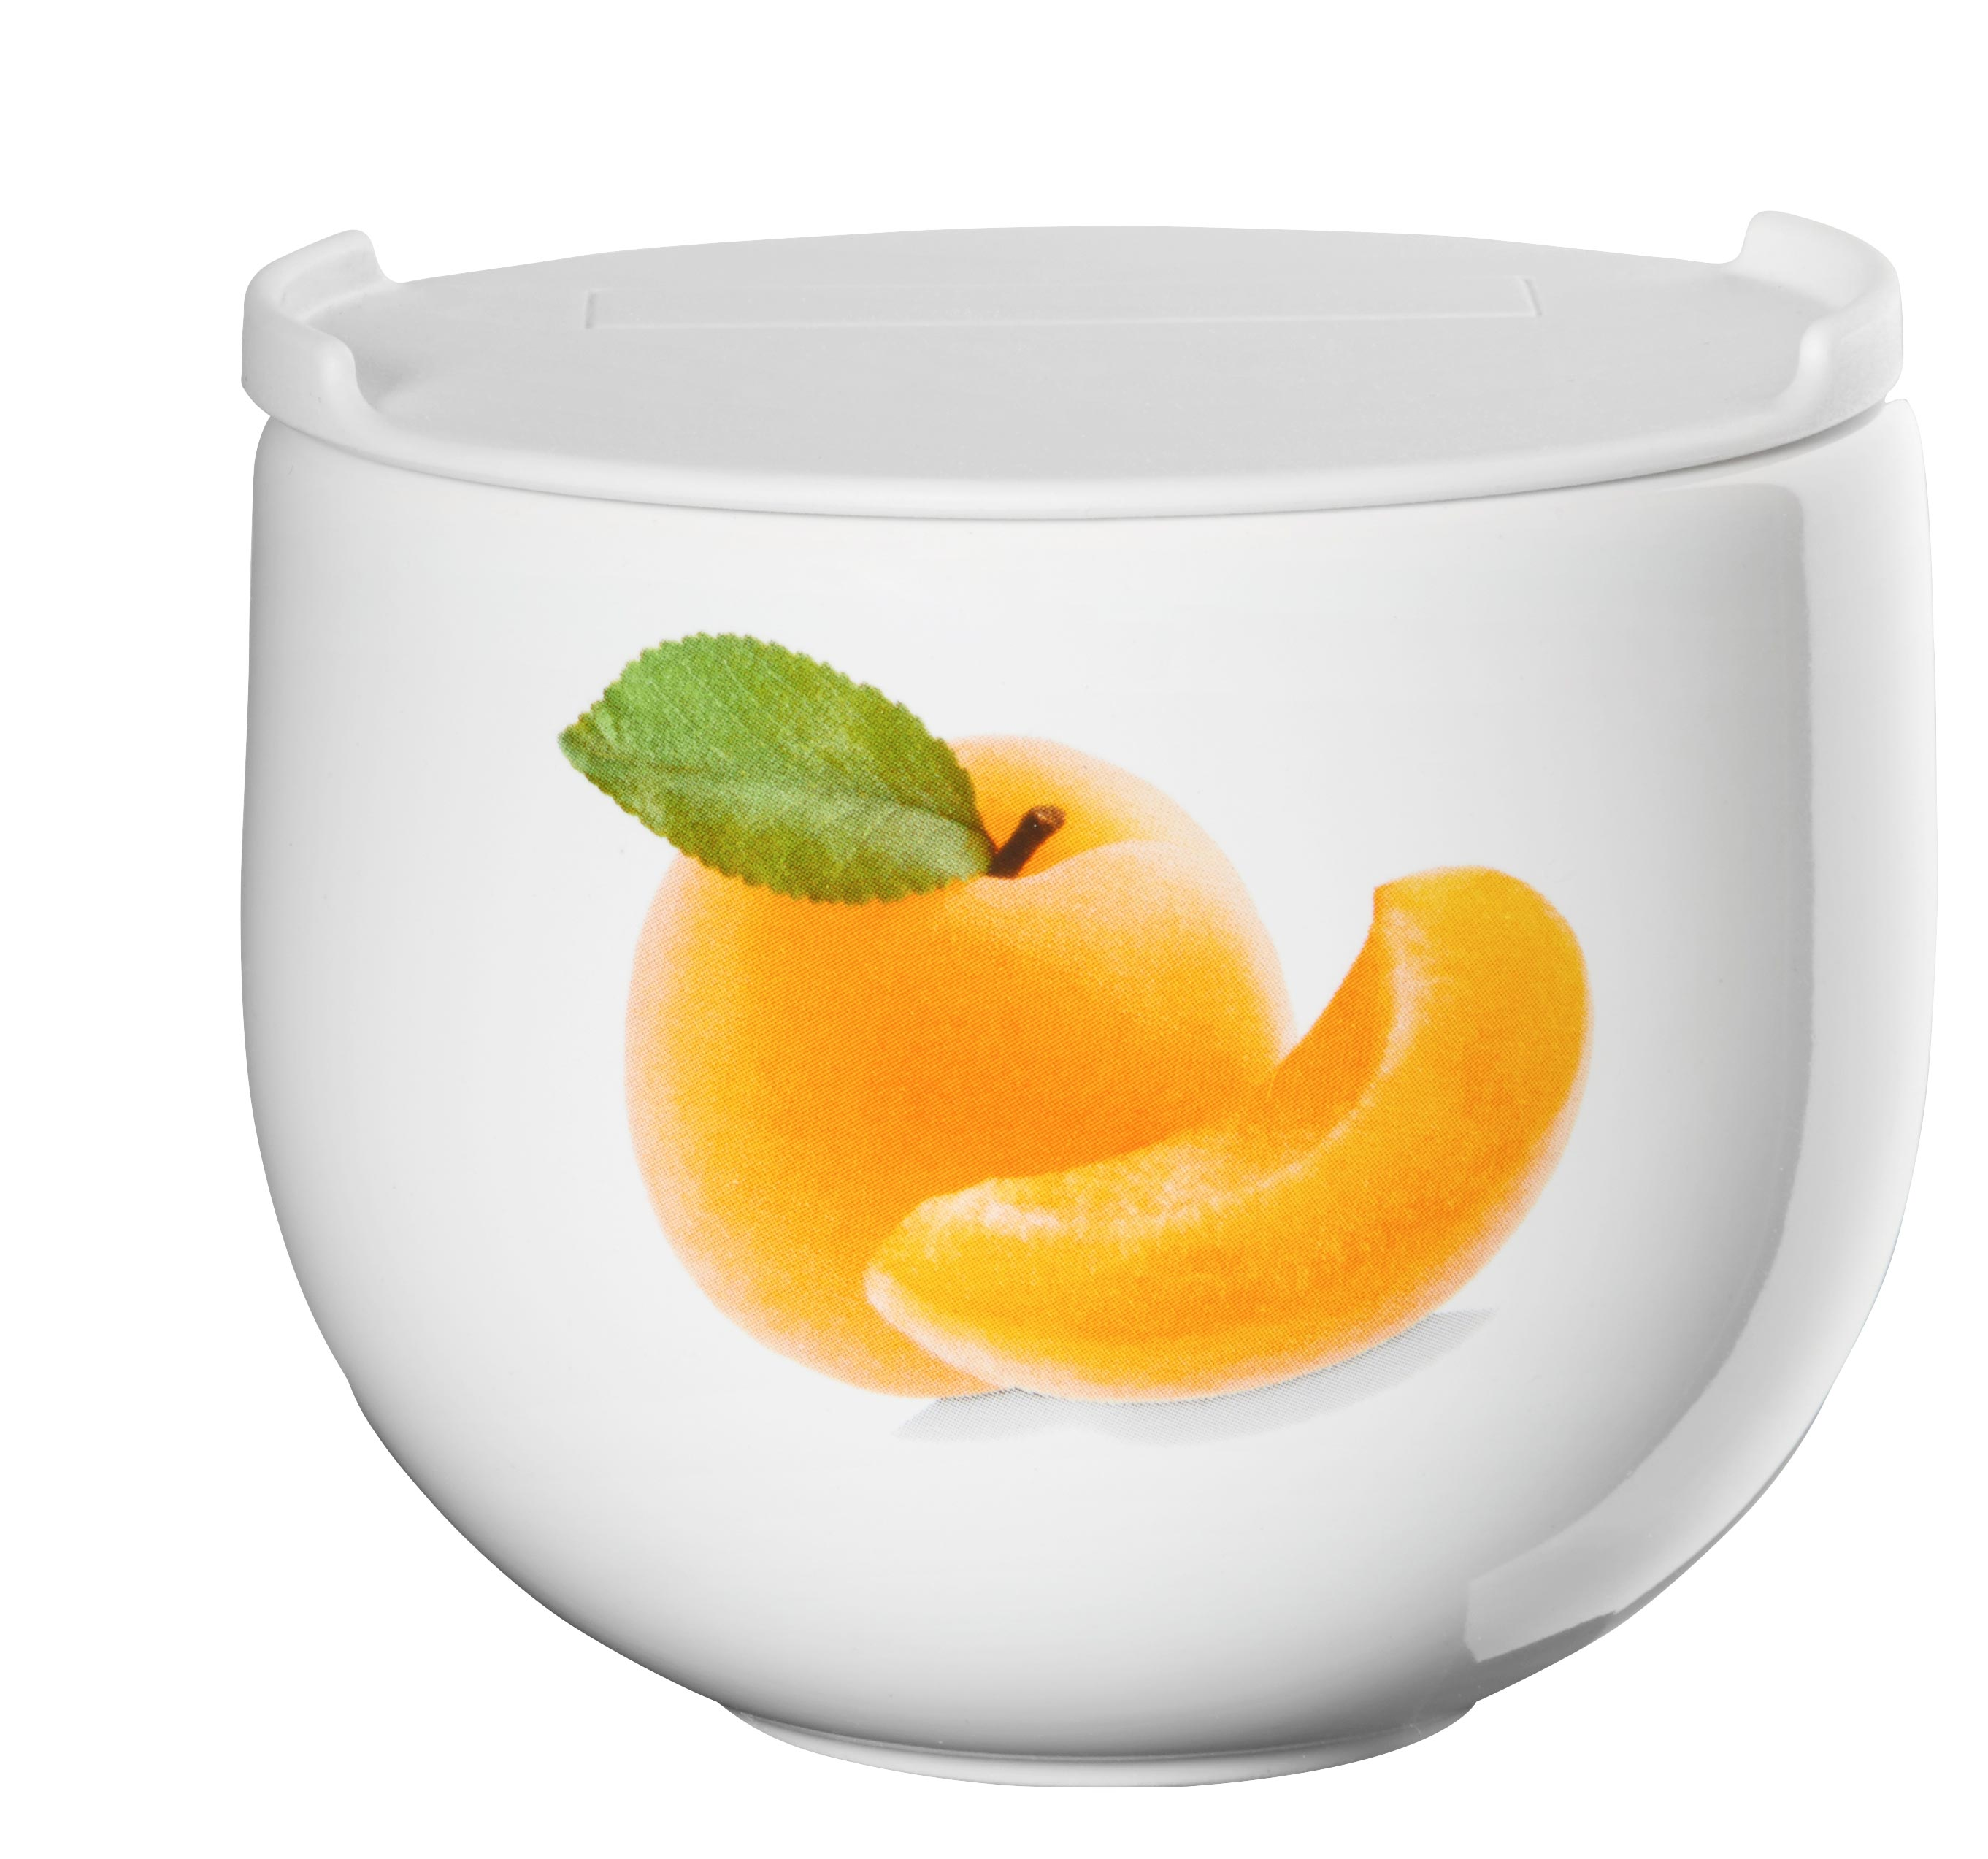 marmeladendose aprikose aufbewahrung bevorratung k che kochen produkte home by asa. Black Bedroom Furniture Sets. Home Design Ideas